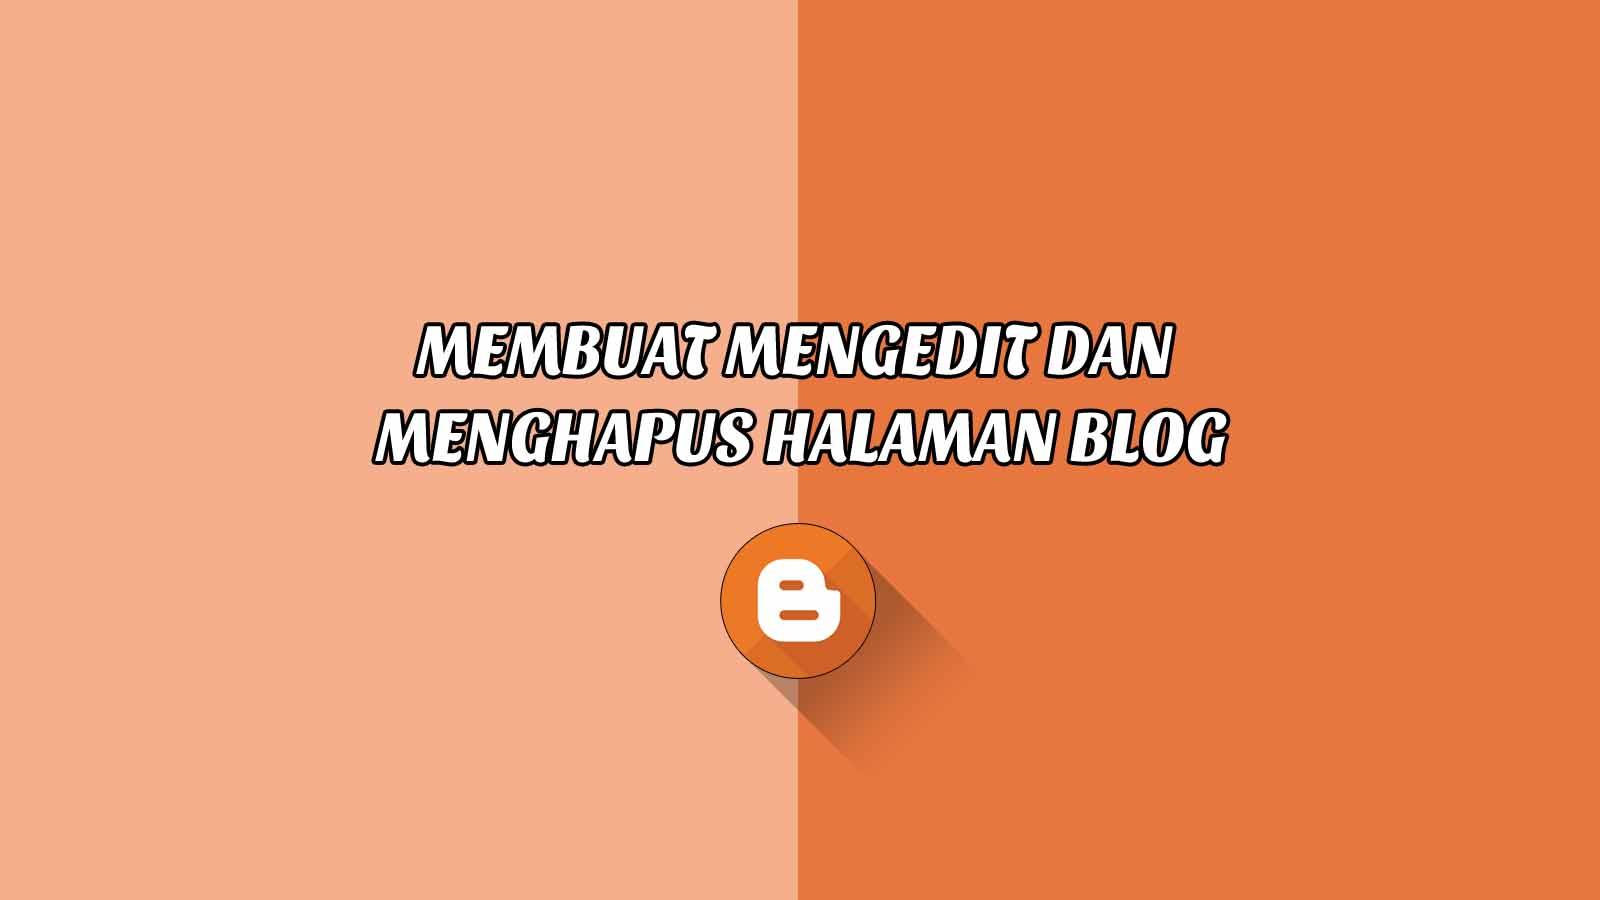 Cara Membuat, Mengedit dan Menghapus Halaman Blog - Tutorial Blogger